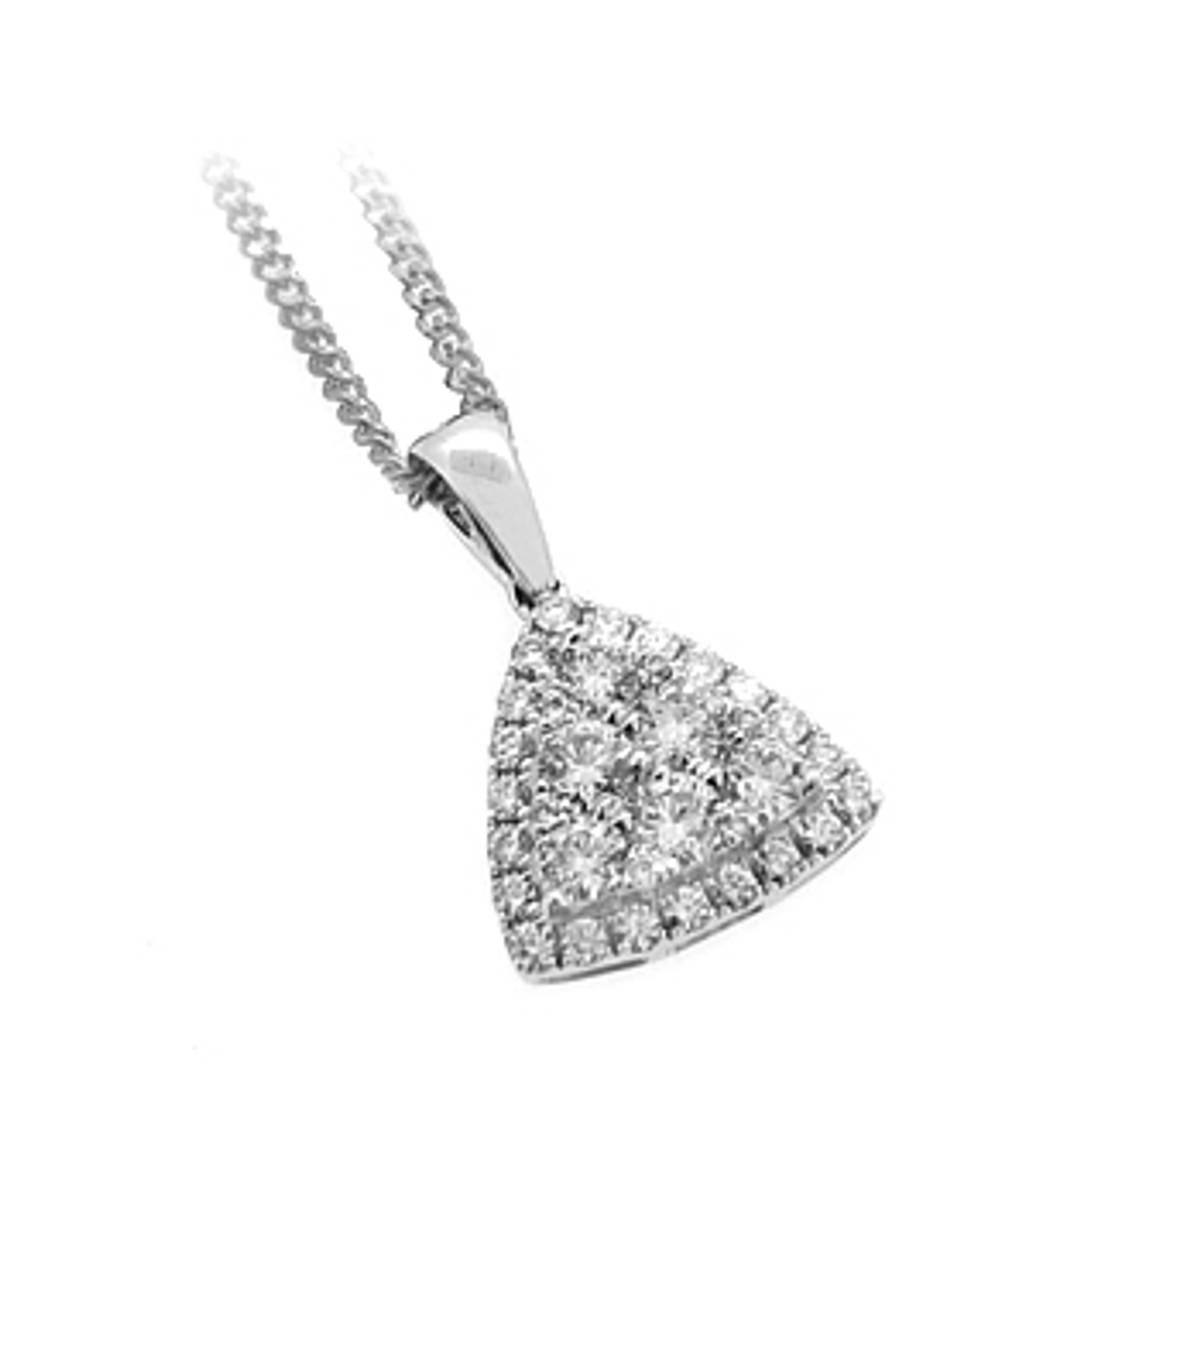 "18k white gold brilliant cut diamond cluster pendant on 18k white gold 18"" chain DETAILS Carat: total diamond weight 0.62cts Pendant length 1.6cm Pendant width 1.2cm"